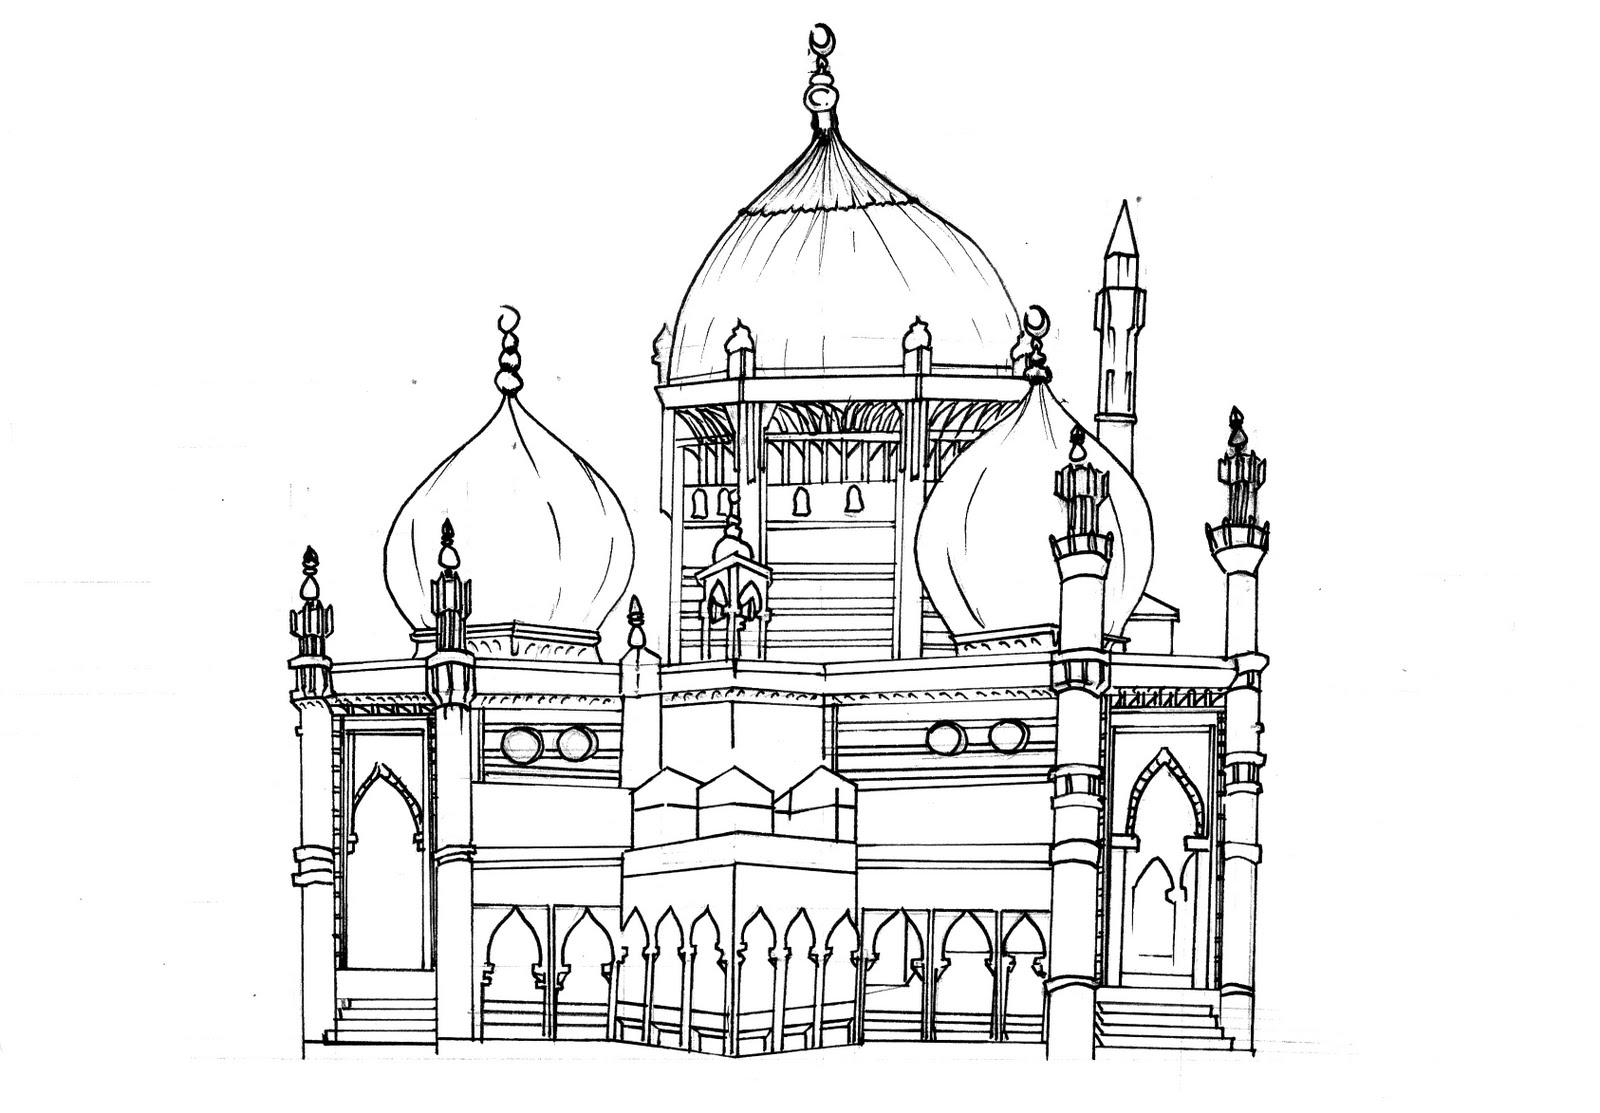 aswaRYUK: Mosque Sketch